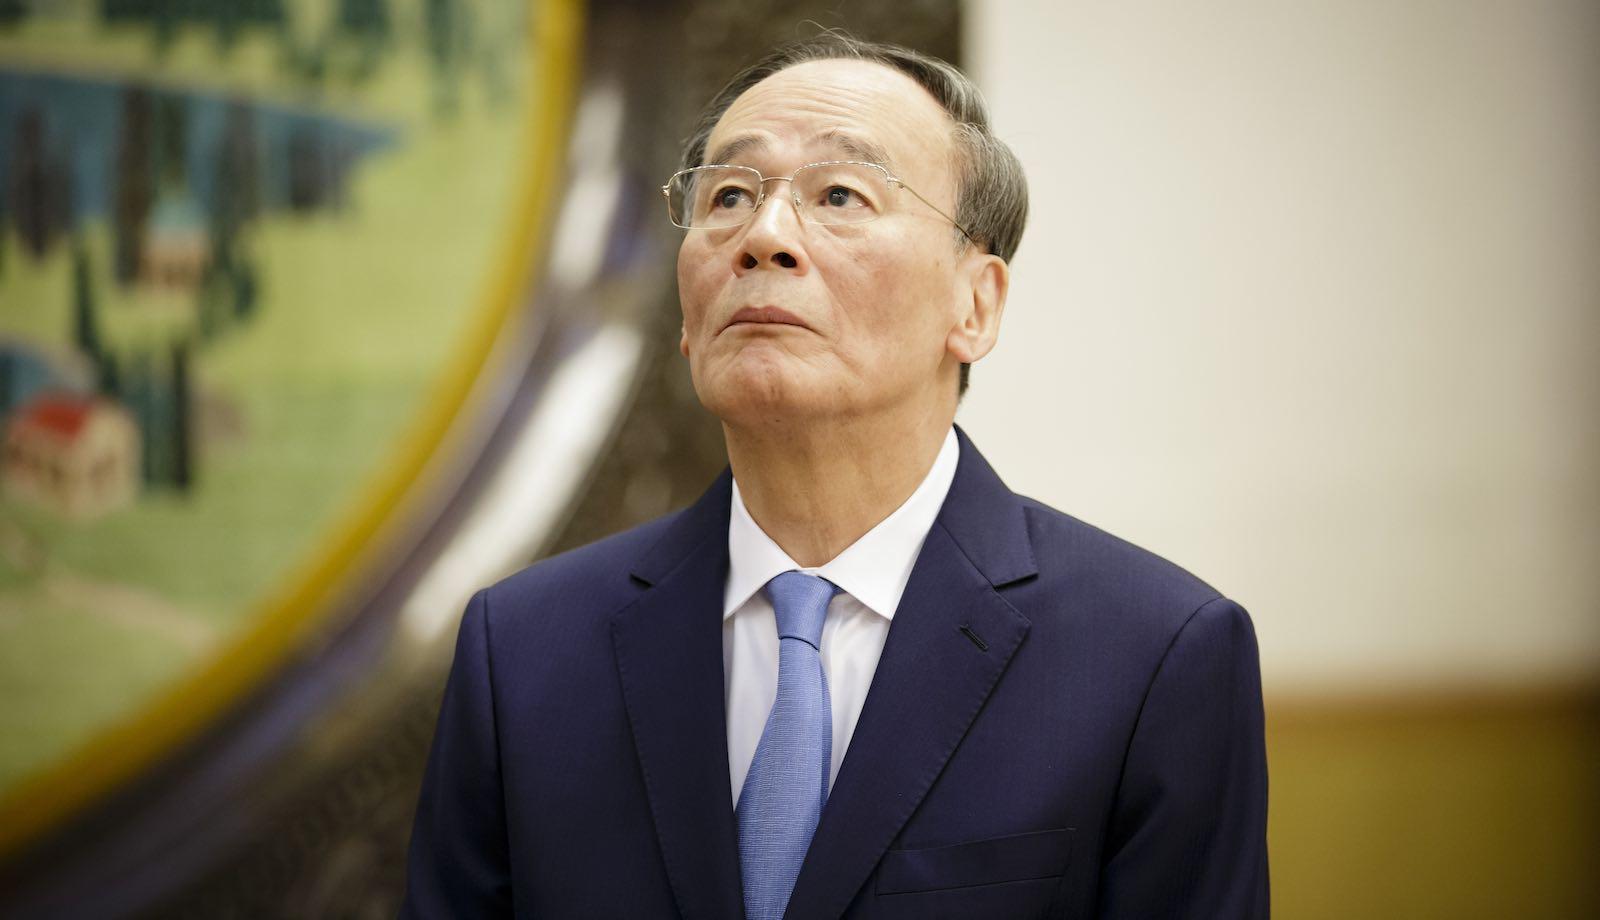 Wang Qishan, Vice President of the People's Republic of China (Photo: Inga Kjer via Getty)